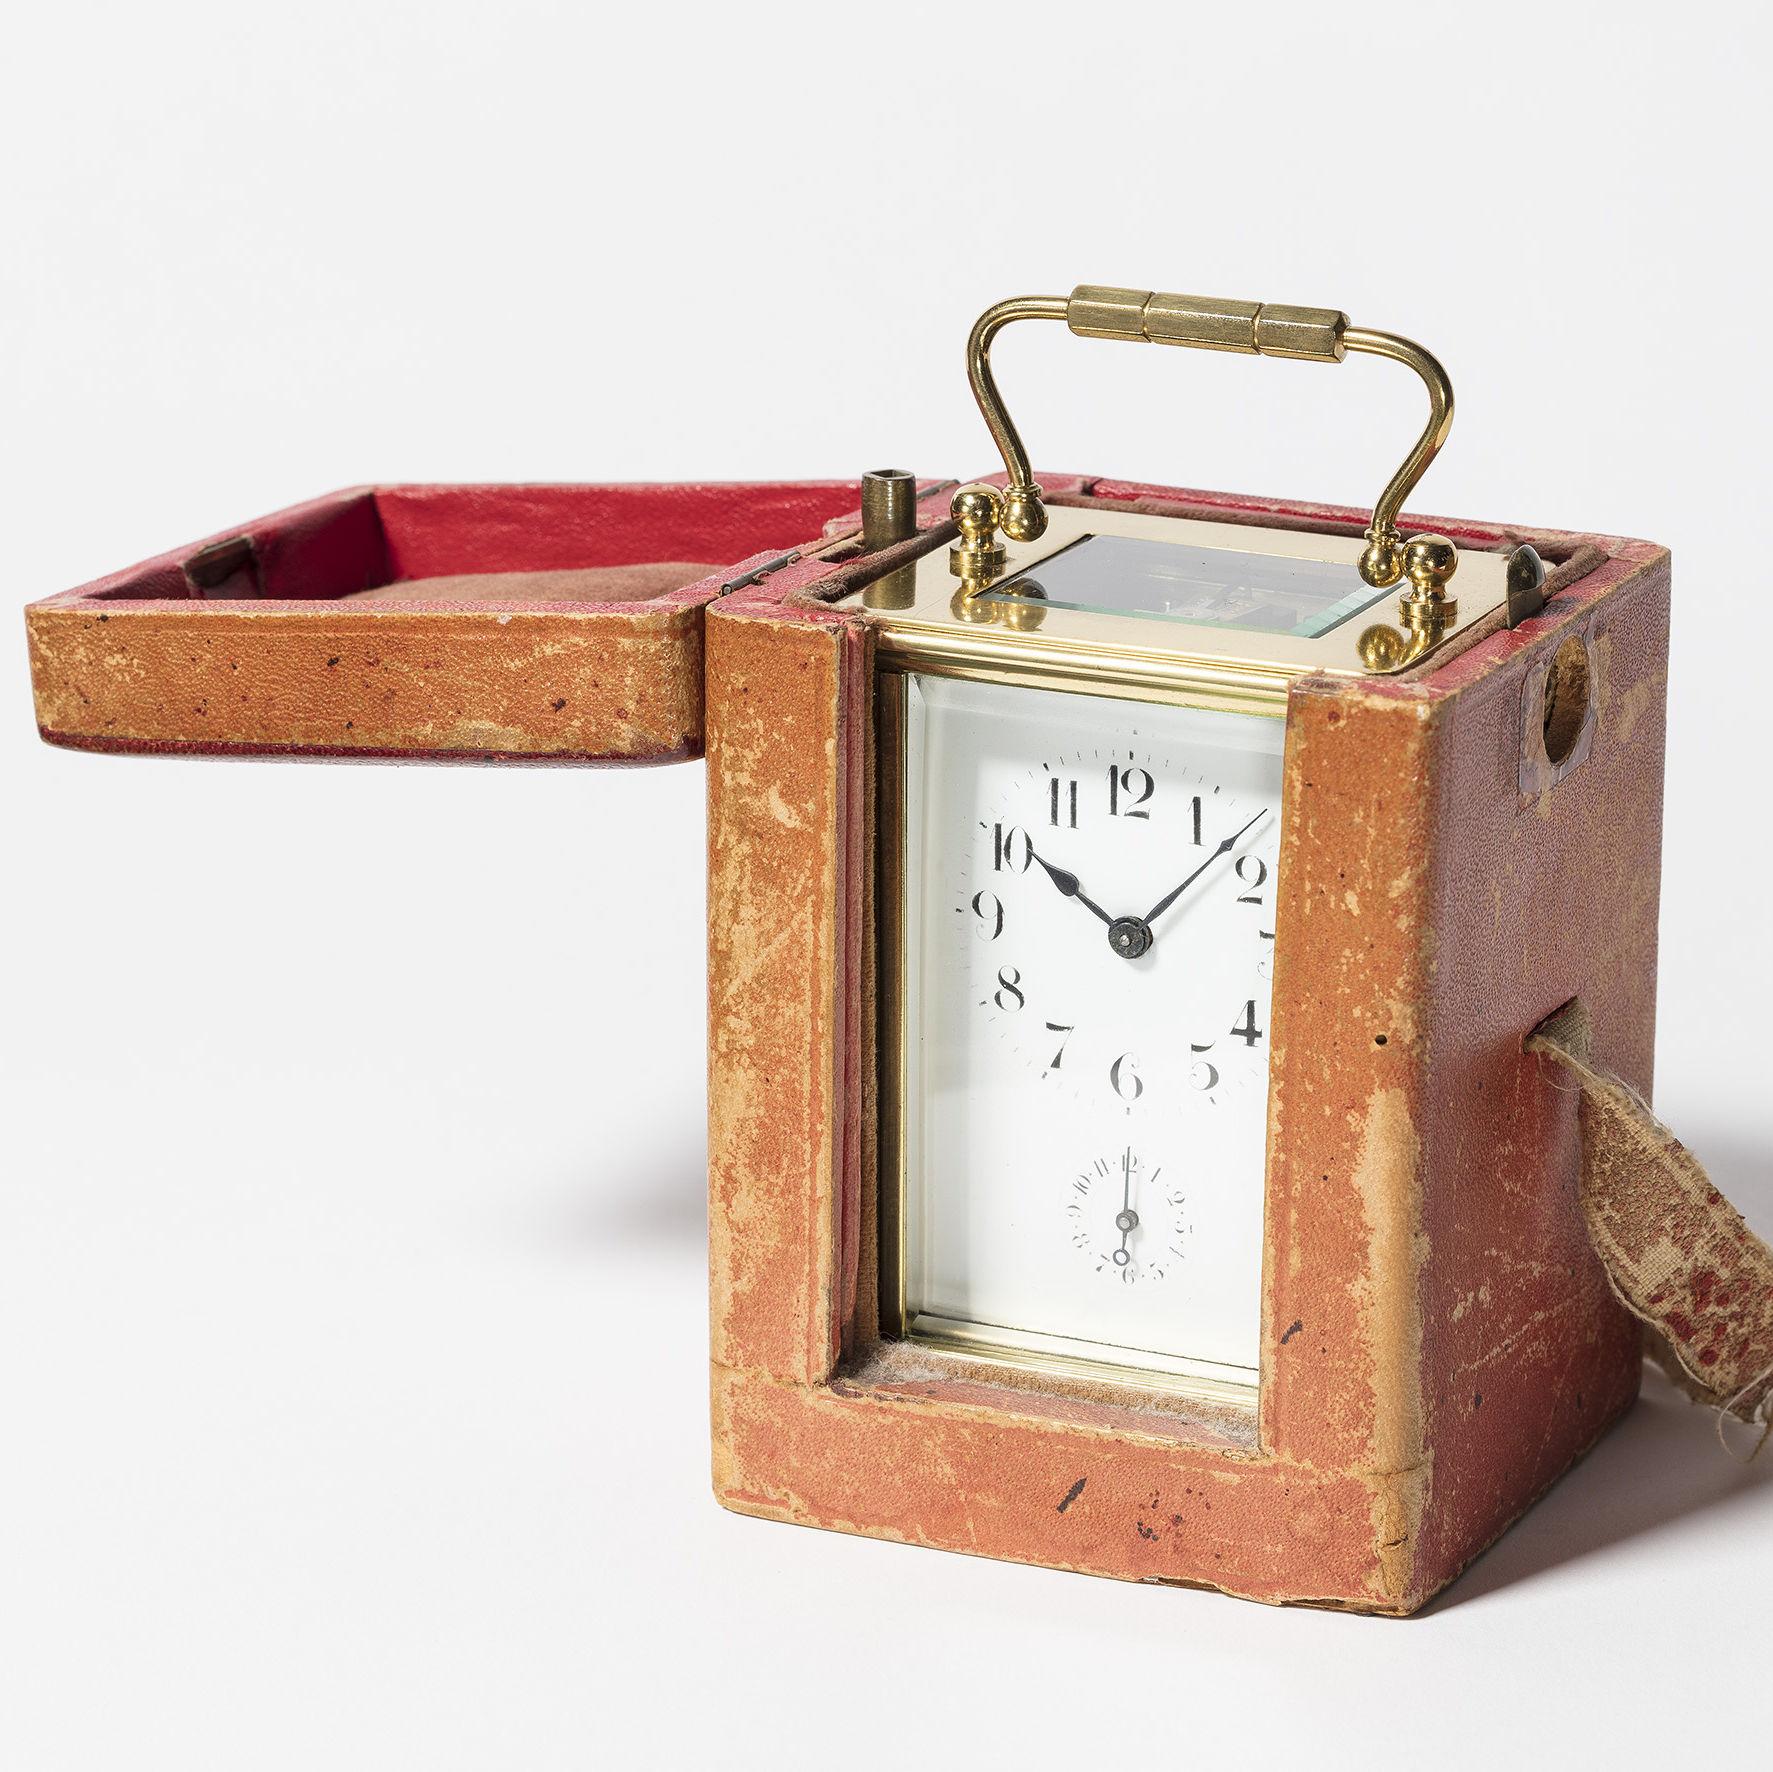 Museum am Mittag: Reiseuhren